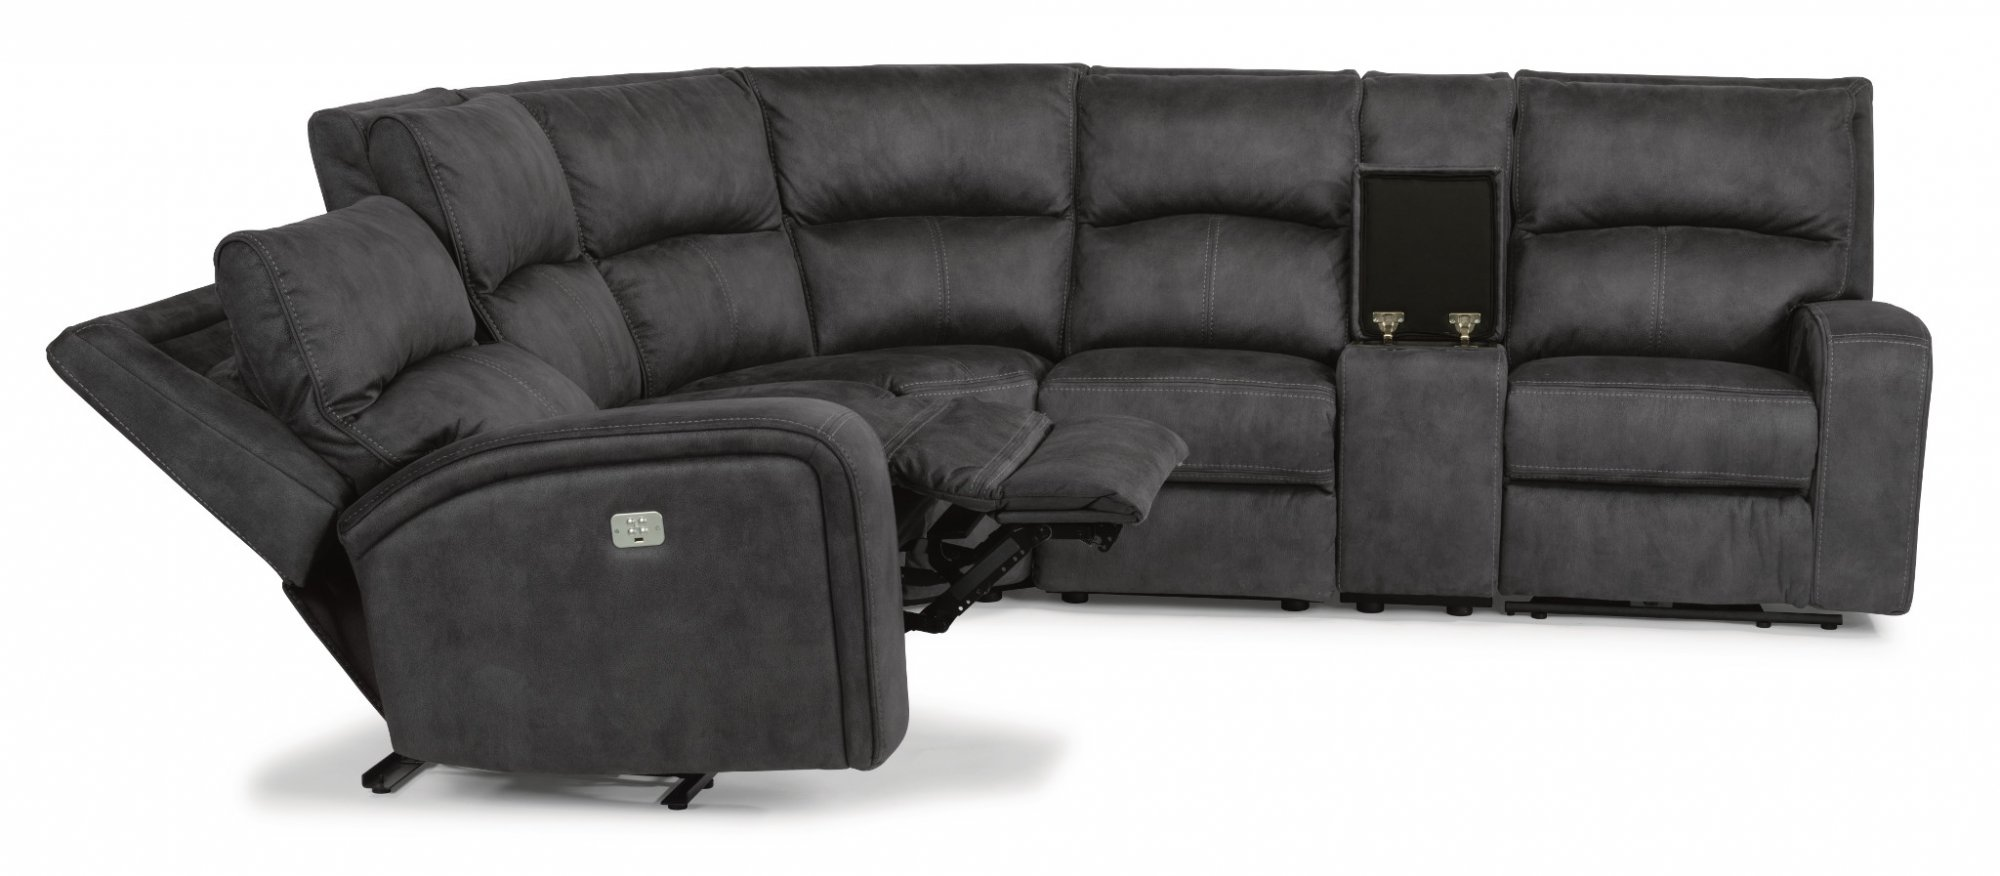 Awesome Rhapsody Power Reclining Fabric Sectional Flexsteel Inzonedesignstudio Interior Chair Design Inzonedesignstudiocom